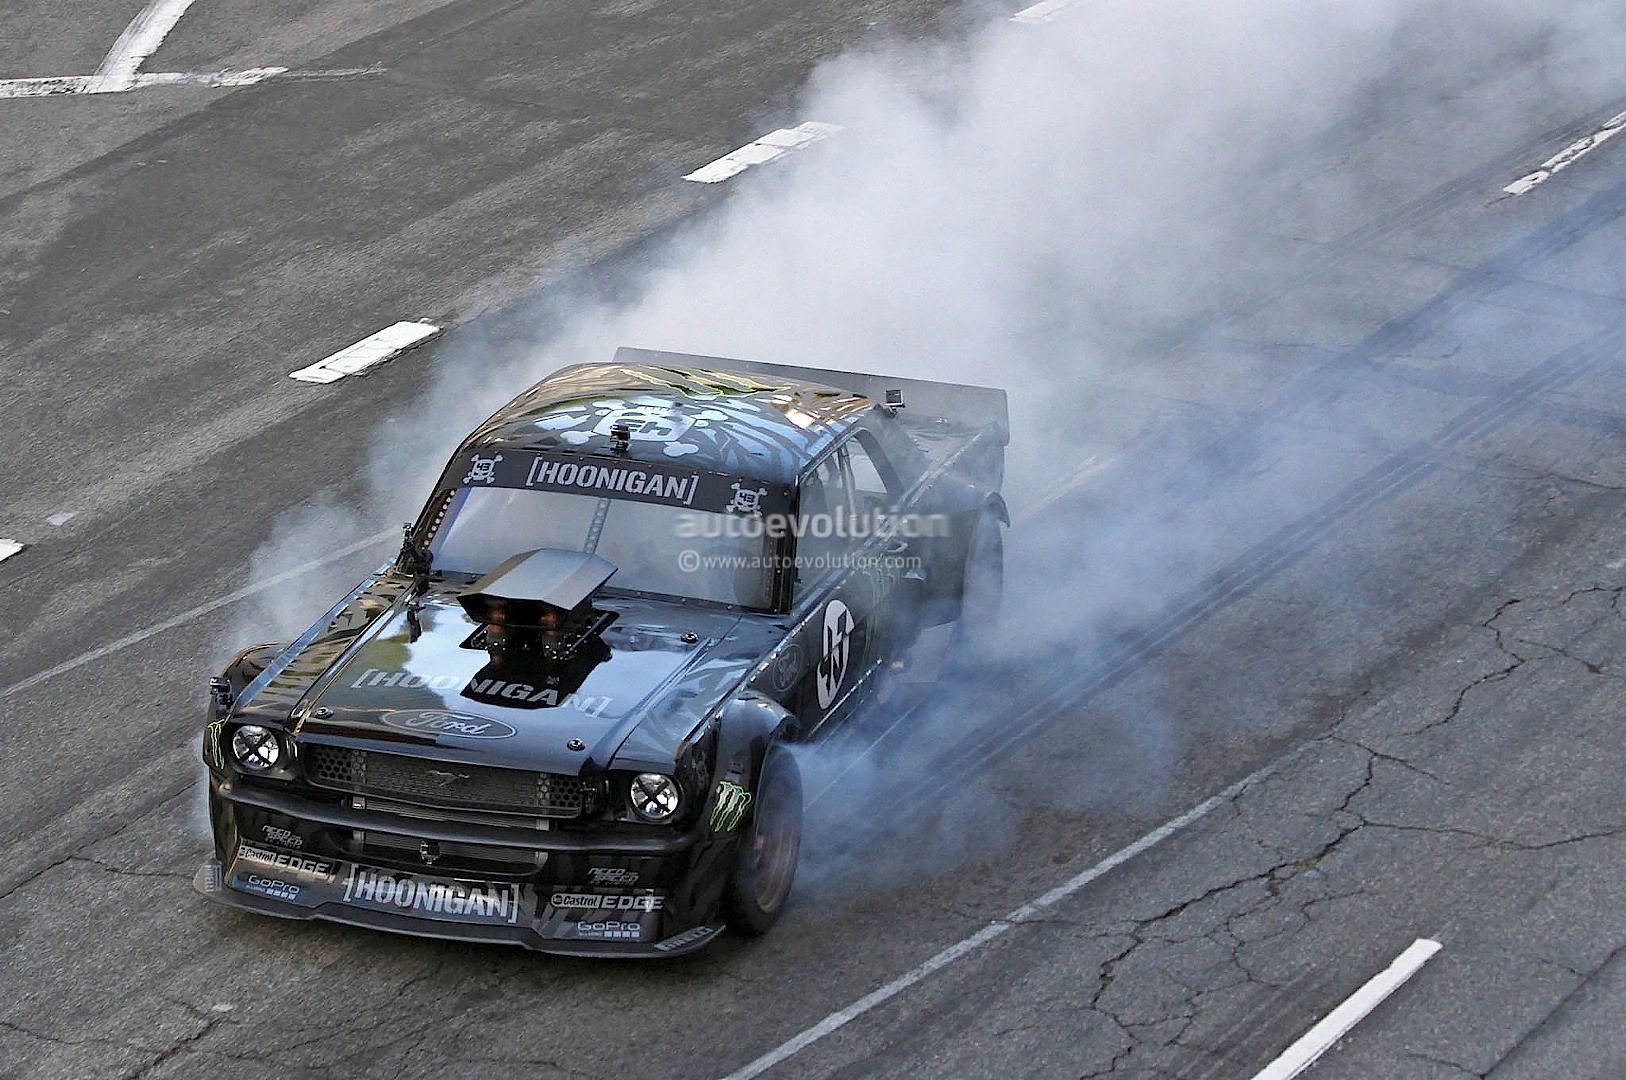 Fast Awd Cars >> Gymkhana 7: Ken Block Drifting AWD Mustang in LA - autoevolution